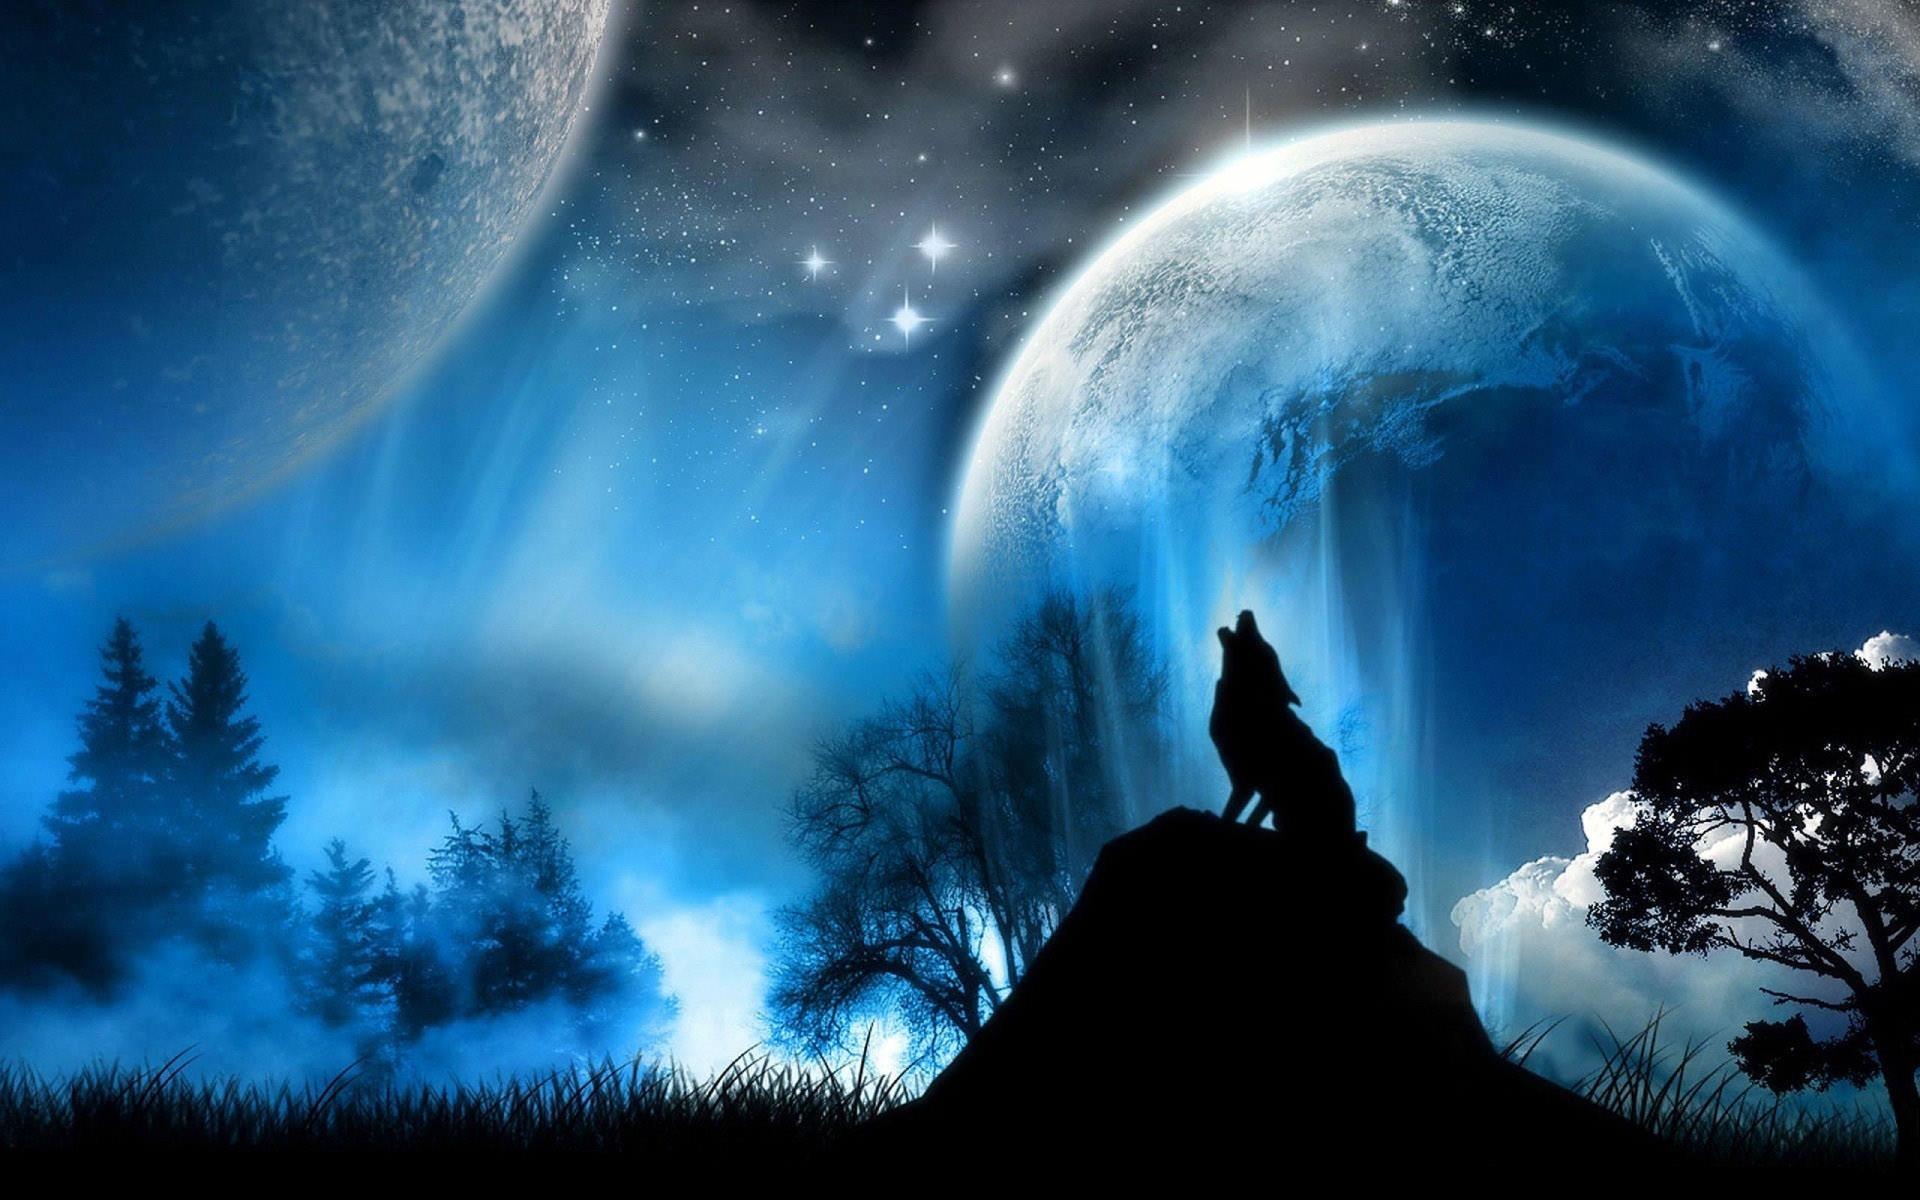 Cool Moon Wallpaper for Desktop moon-cool-pictures-for-desktop-background -best-wallpaper-